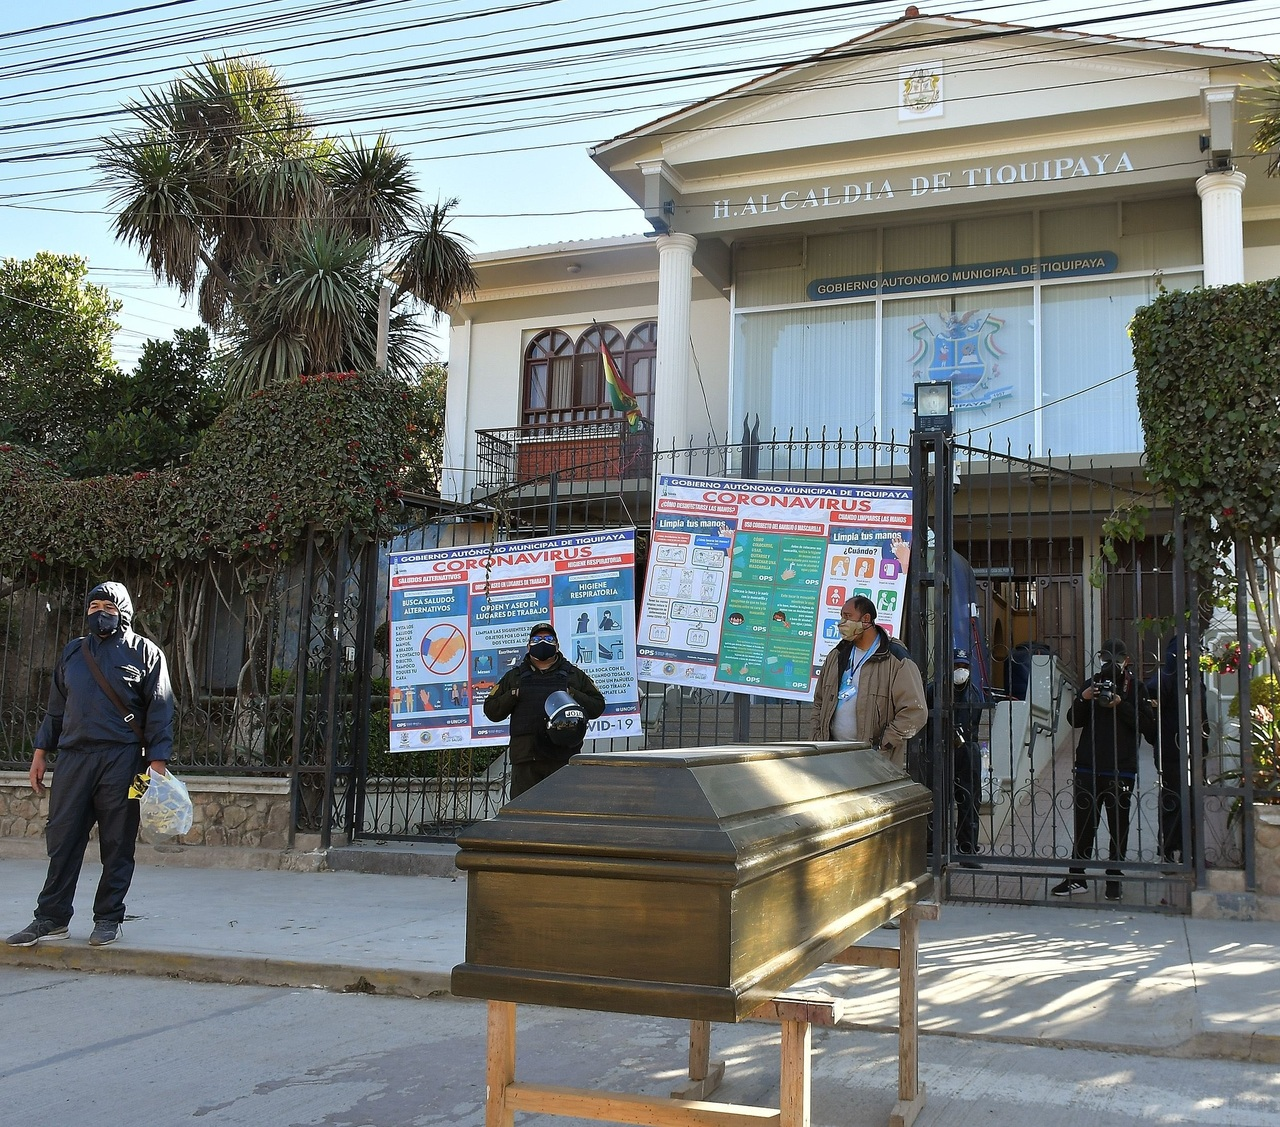 Bolivia aplica un gobierno virtual